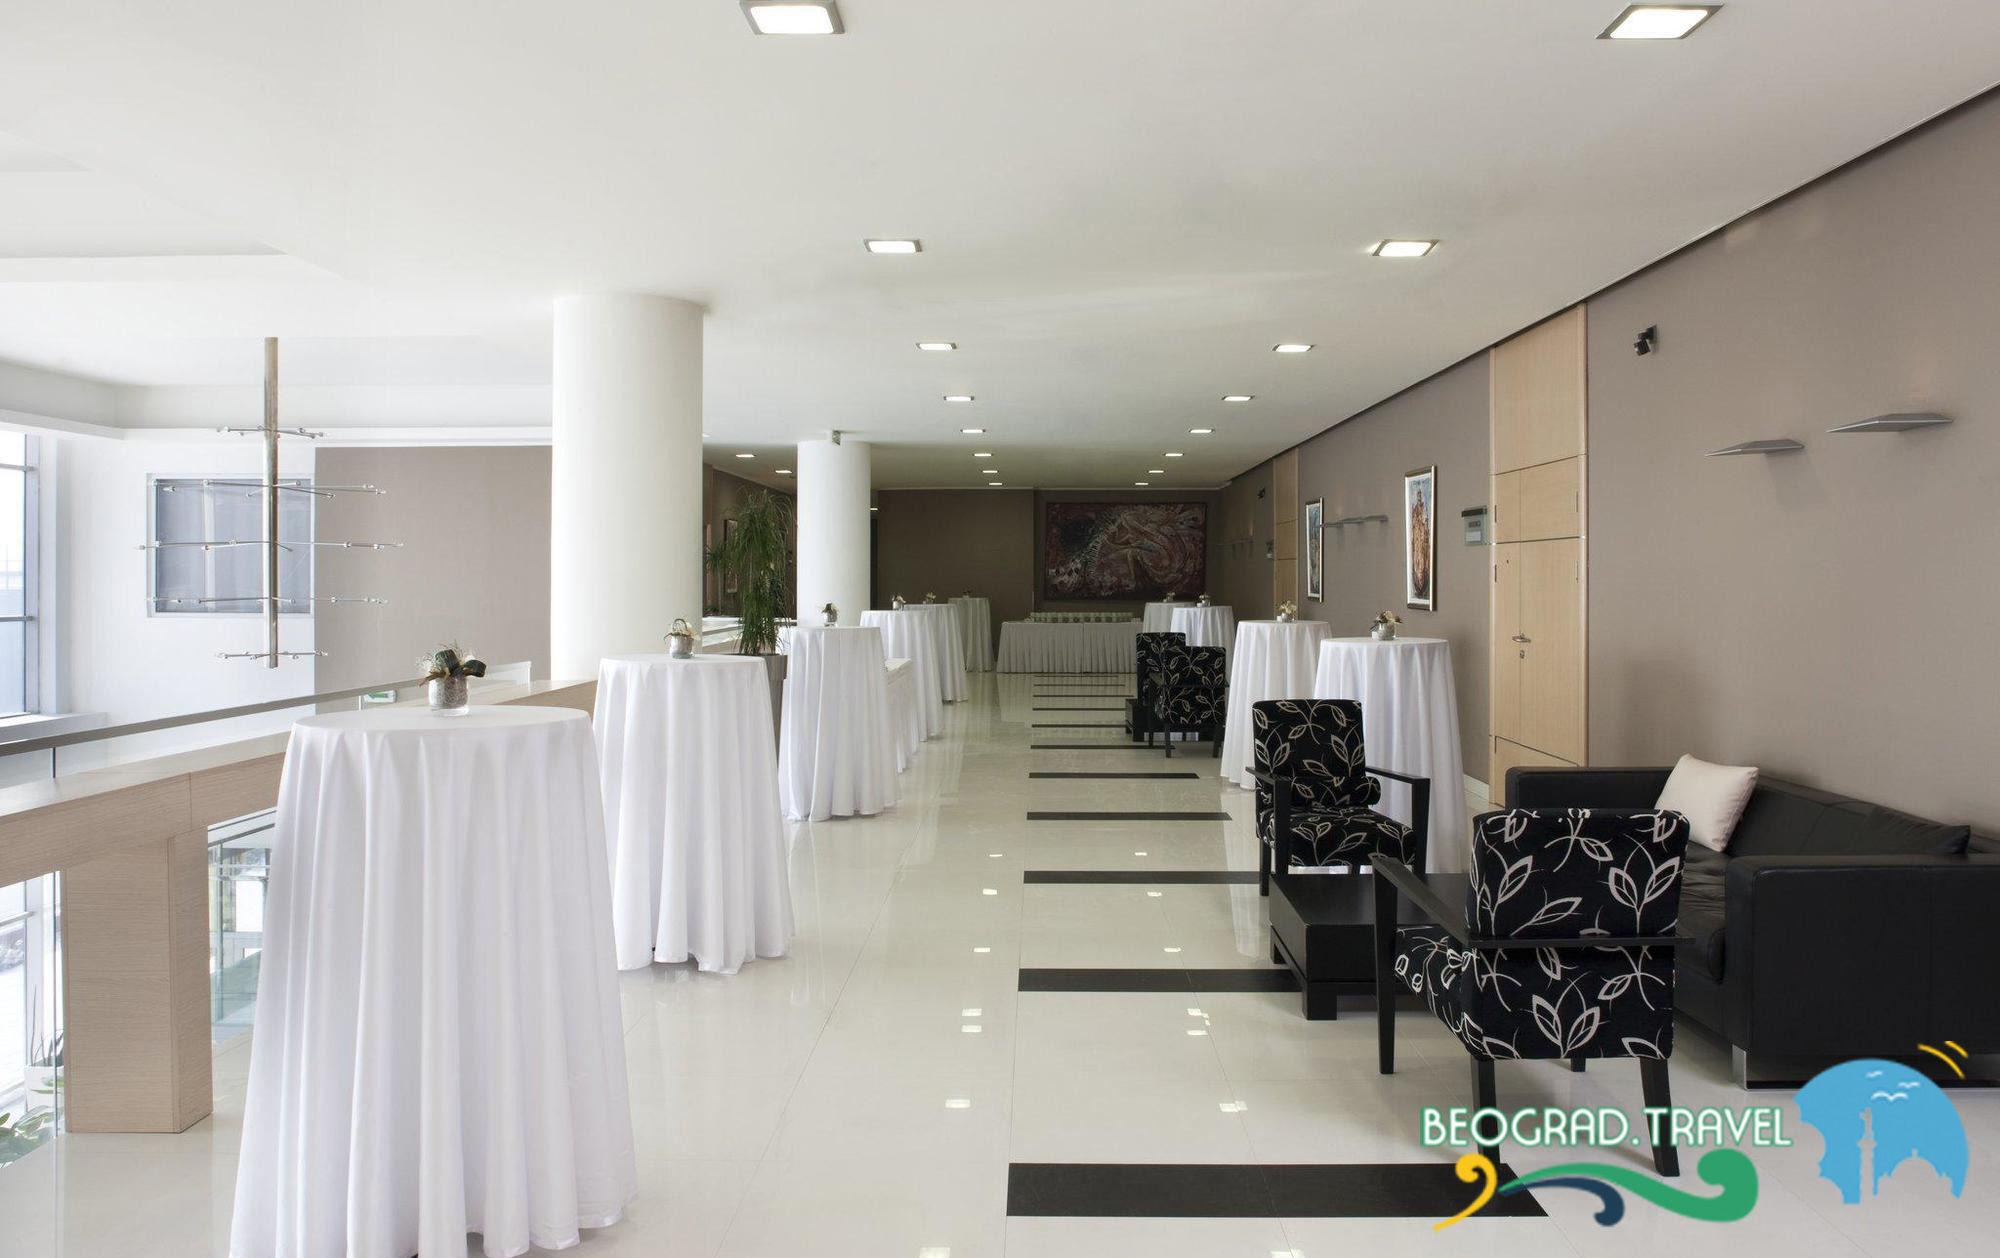 Holiday Inn Beograd Savrsen Izbor Za Poslovne Sastanke I Odmor